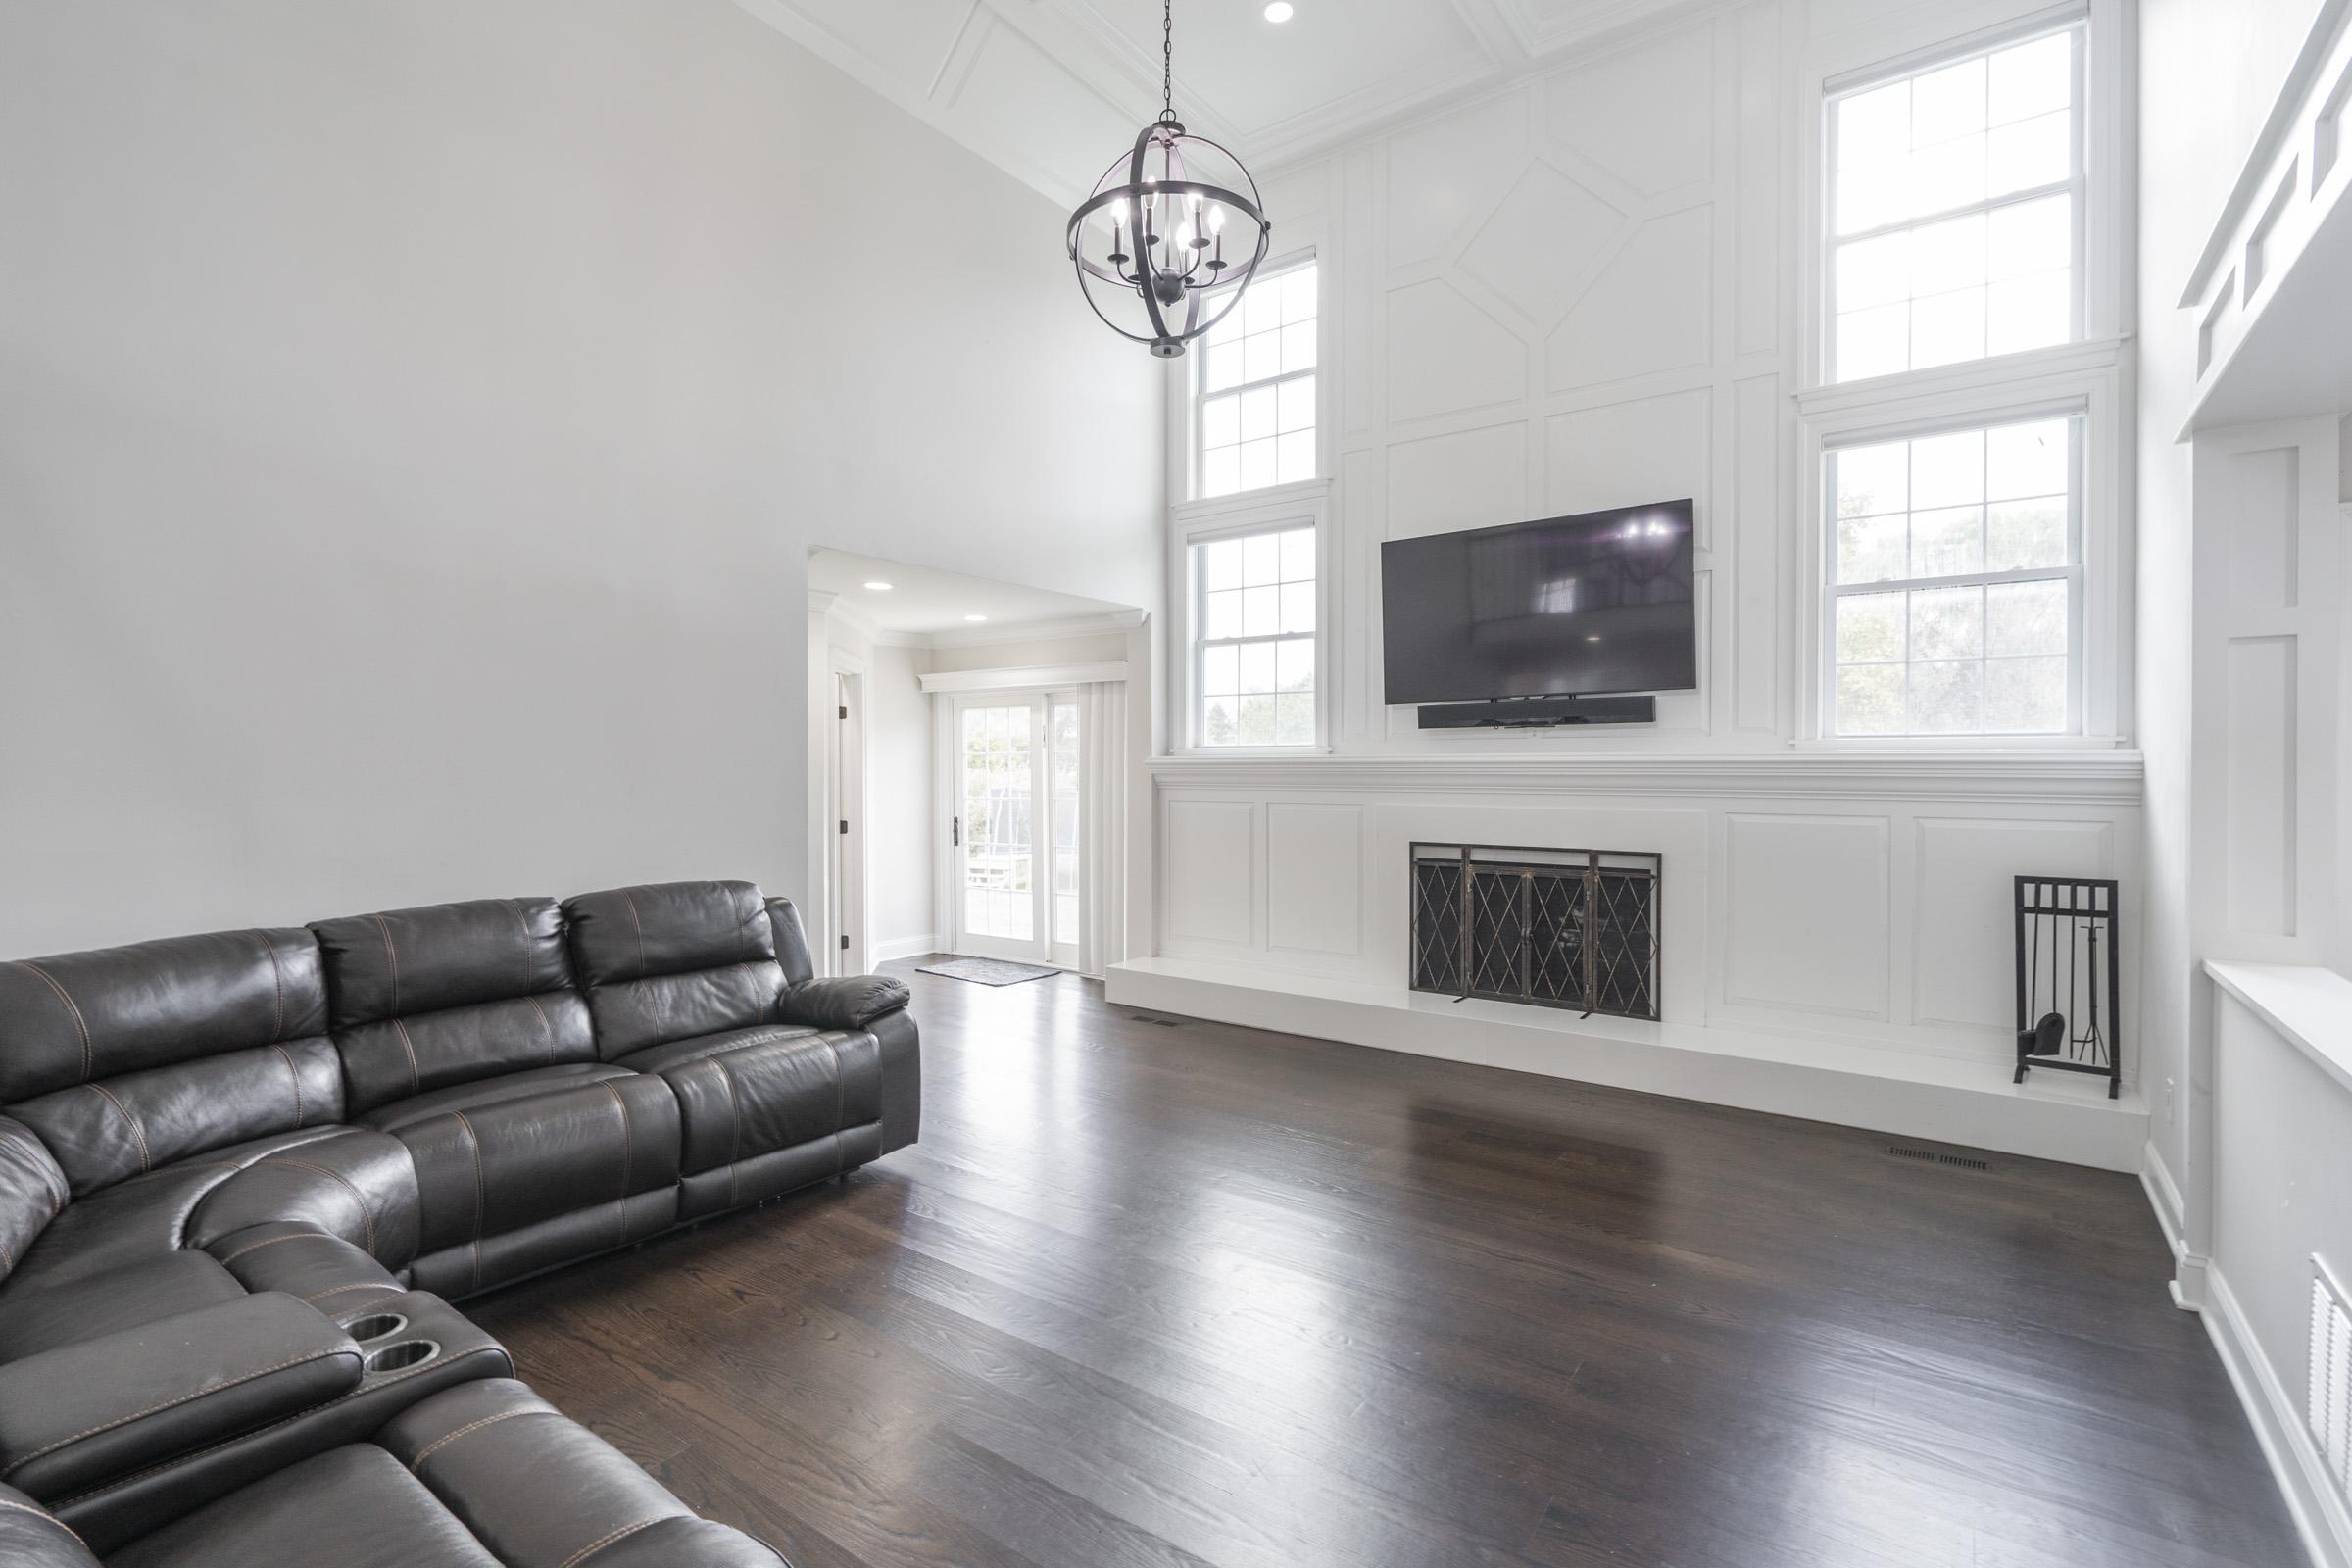 Family Room - Moldings